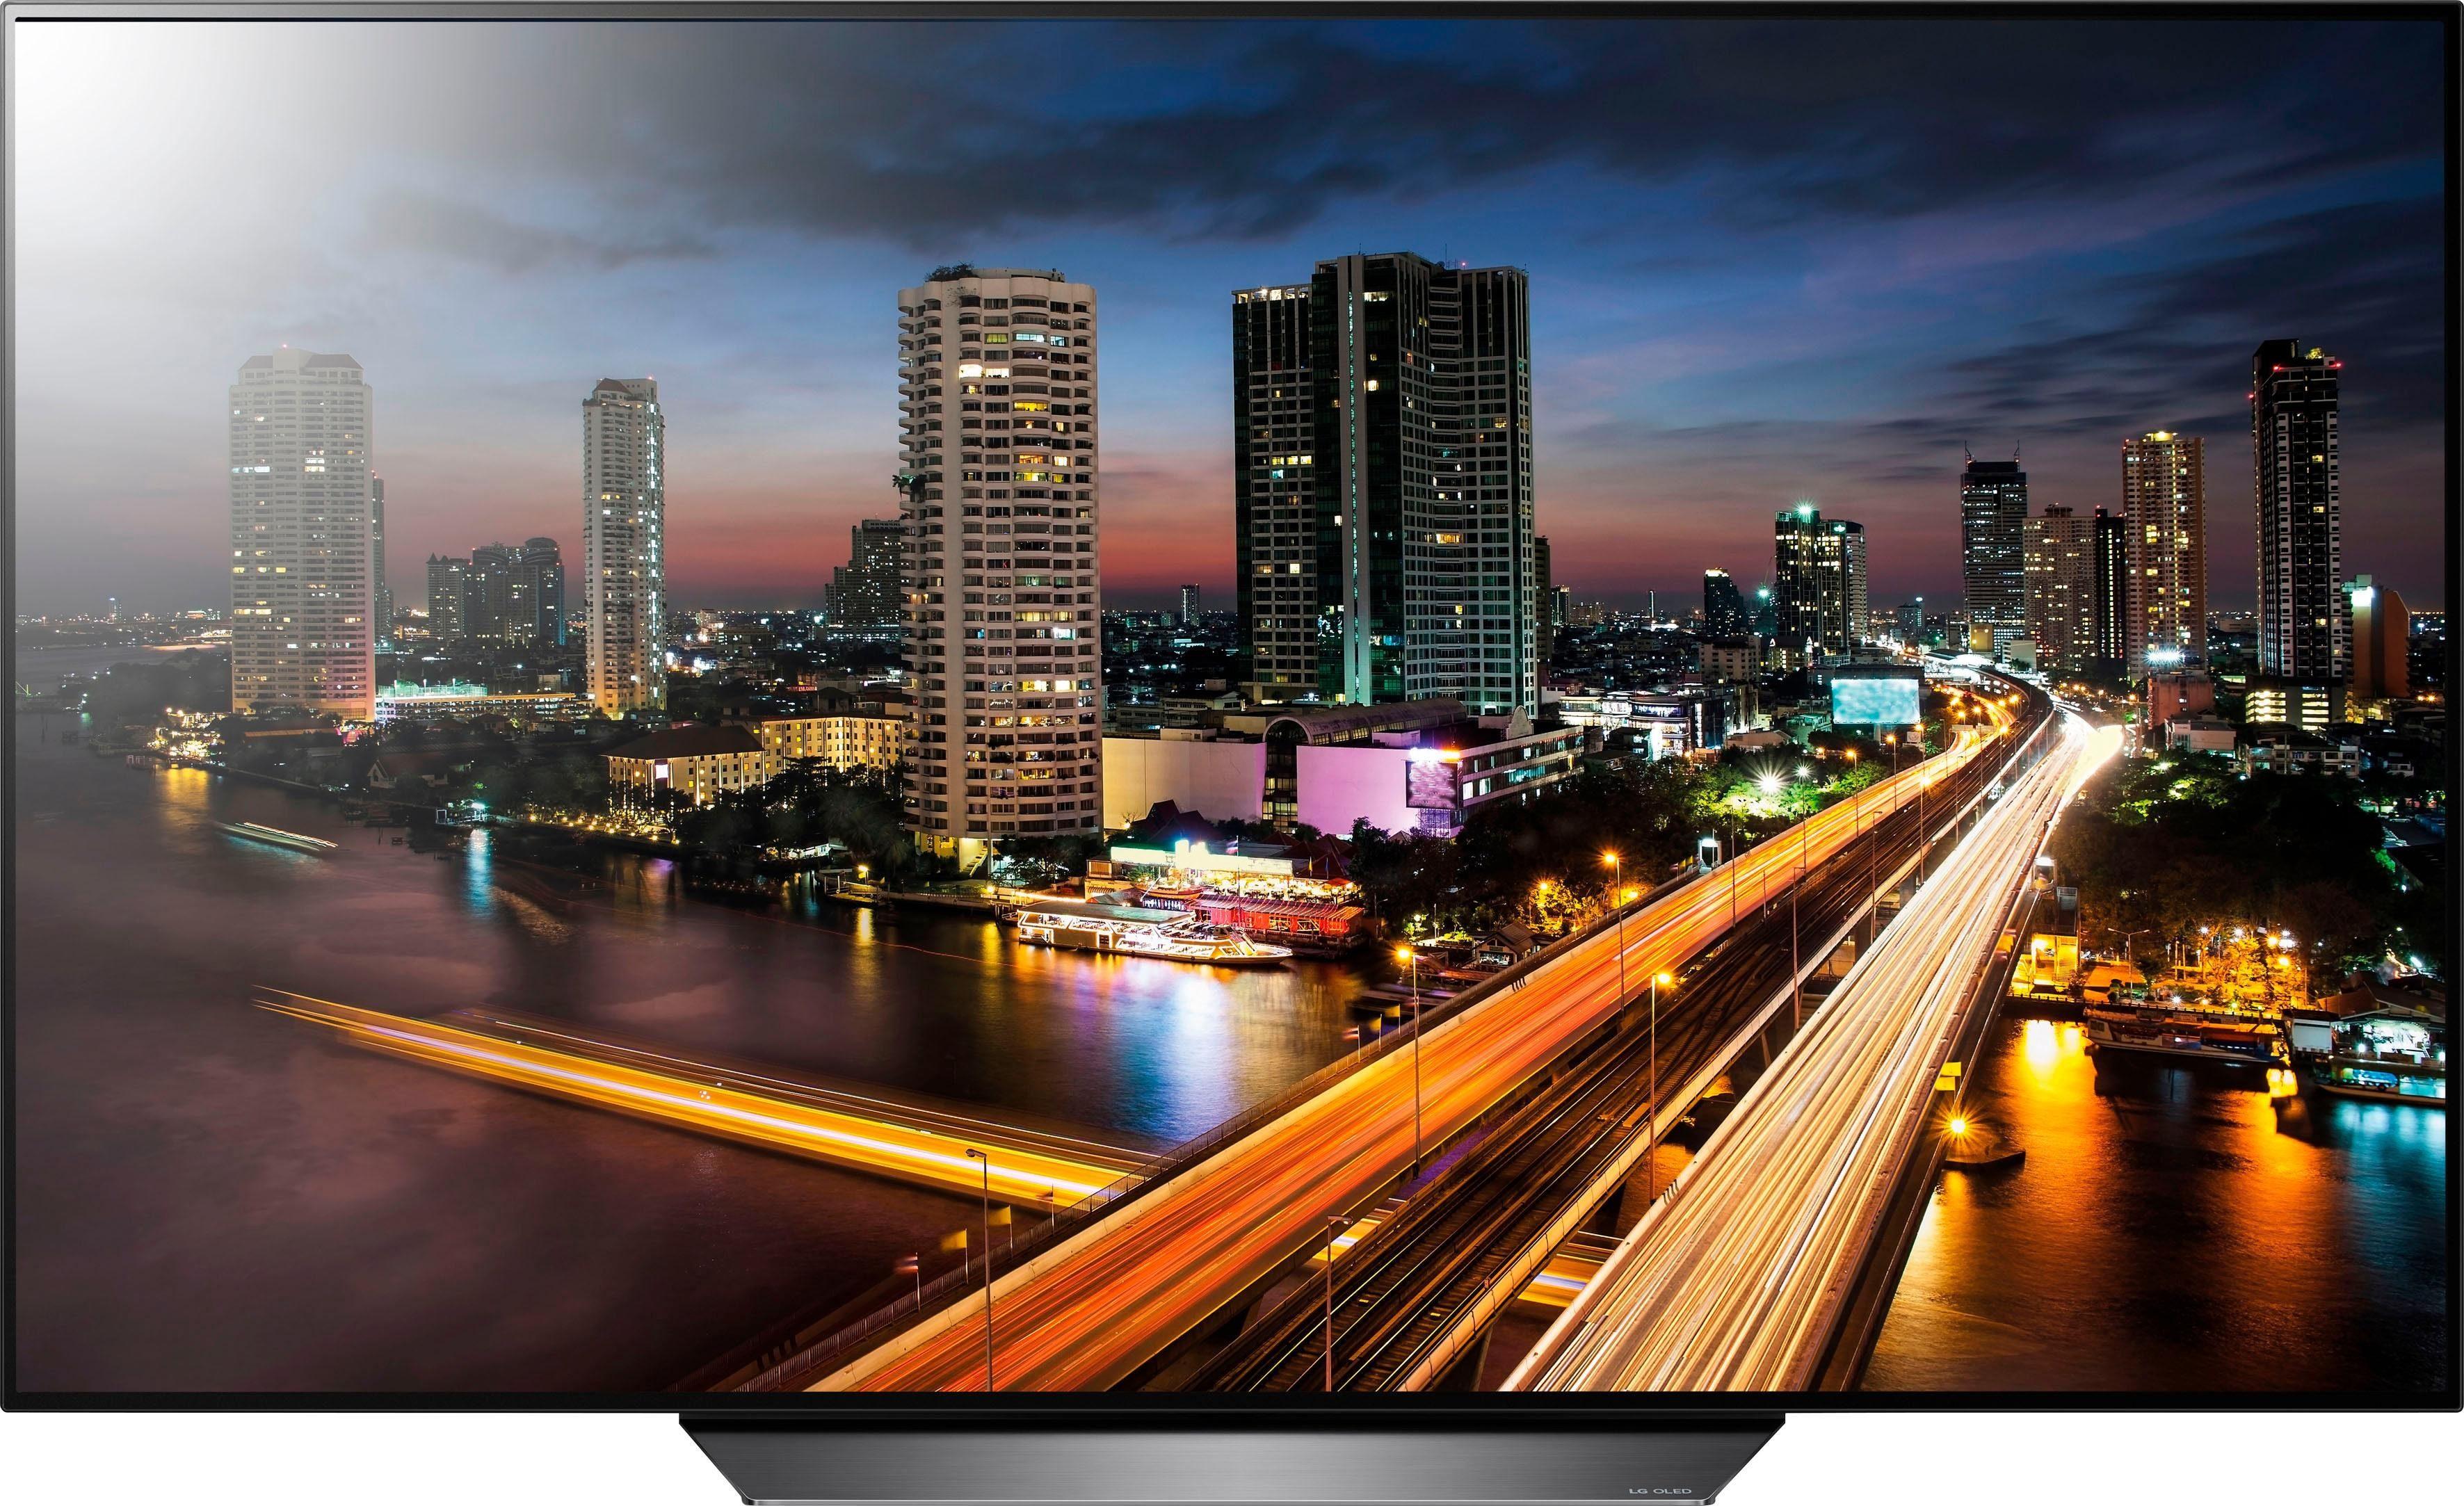 LG OLED55B8LLA OLED-Fernseher (139 cm/55 Zoll, 4K Ultra HD, Smart-TV) - LG